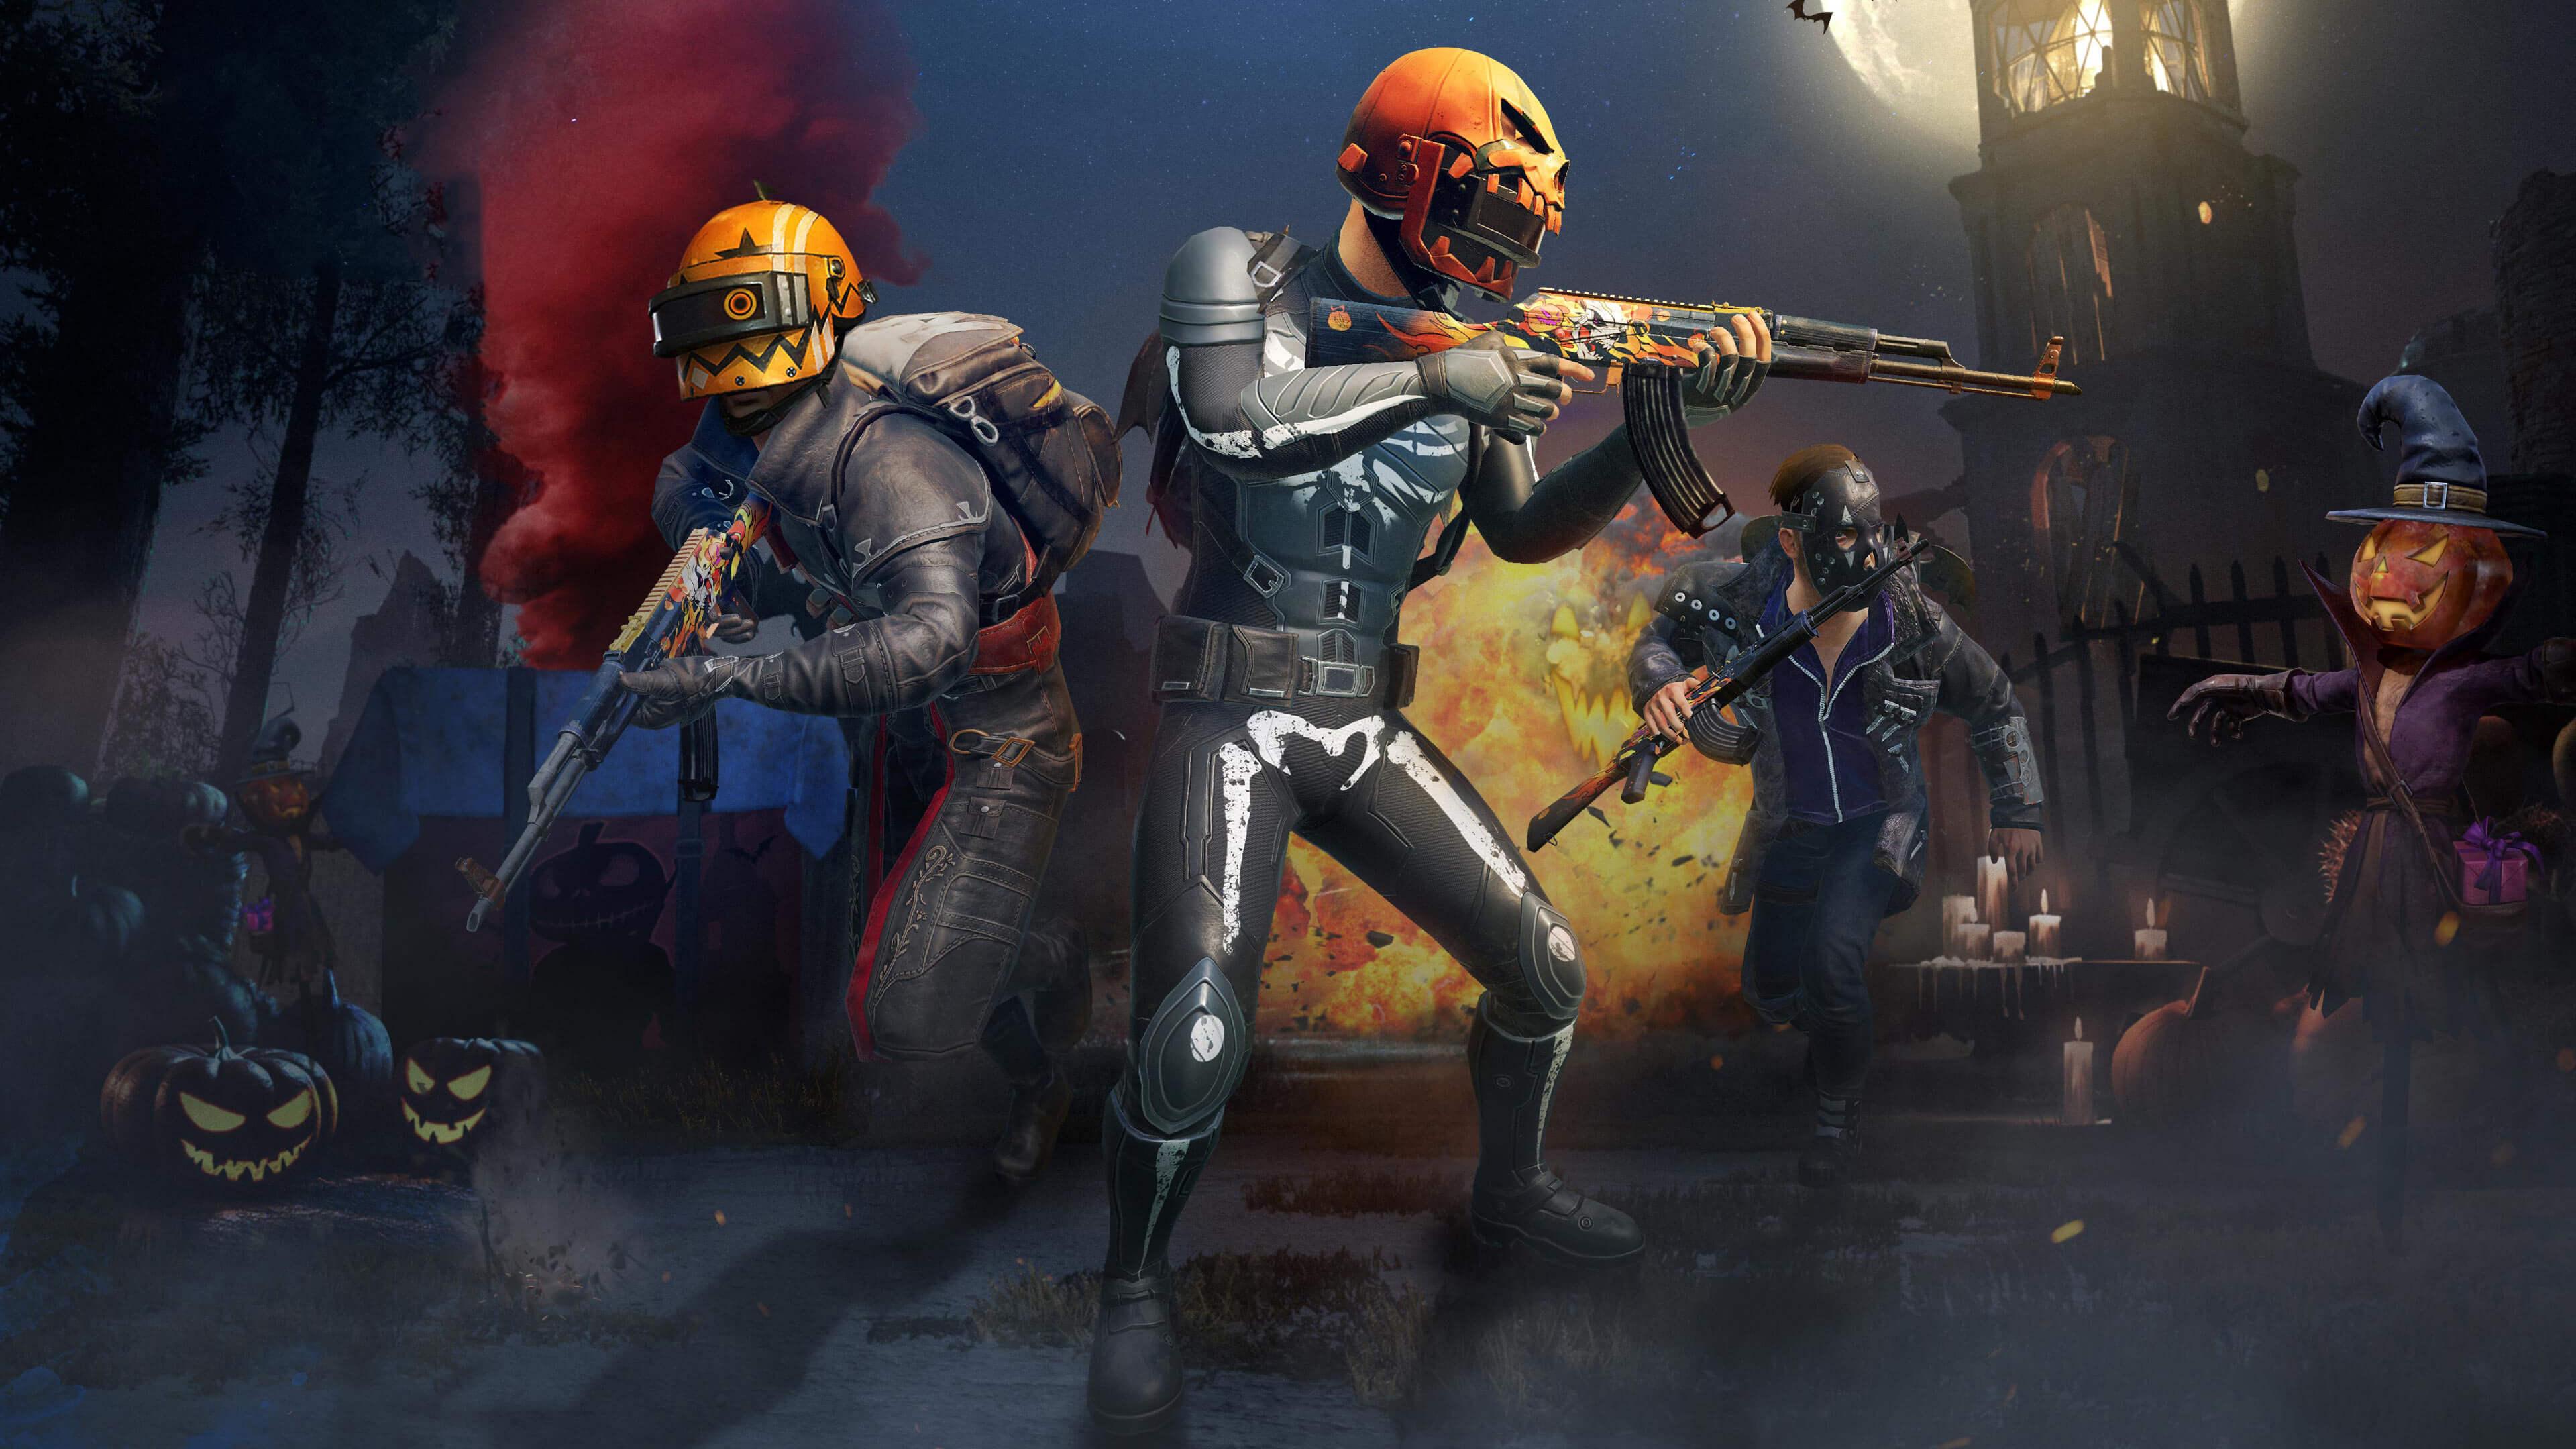 Обои PlayerUnknown's Battlegrounds хэллоуин